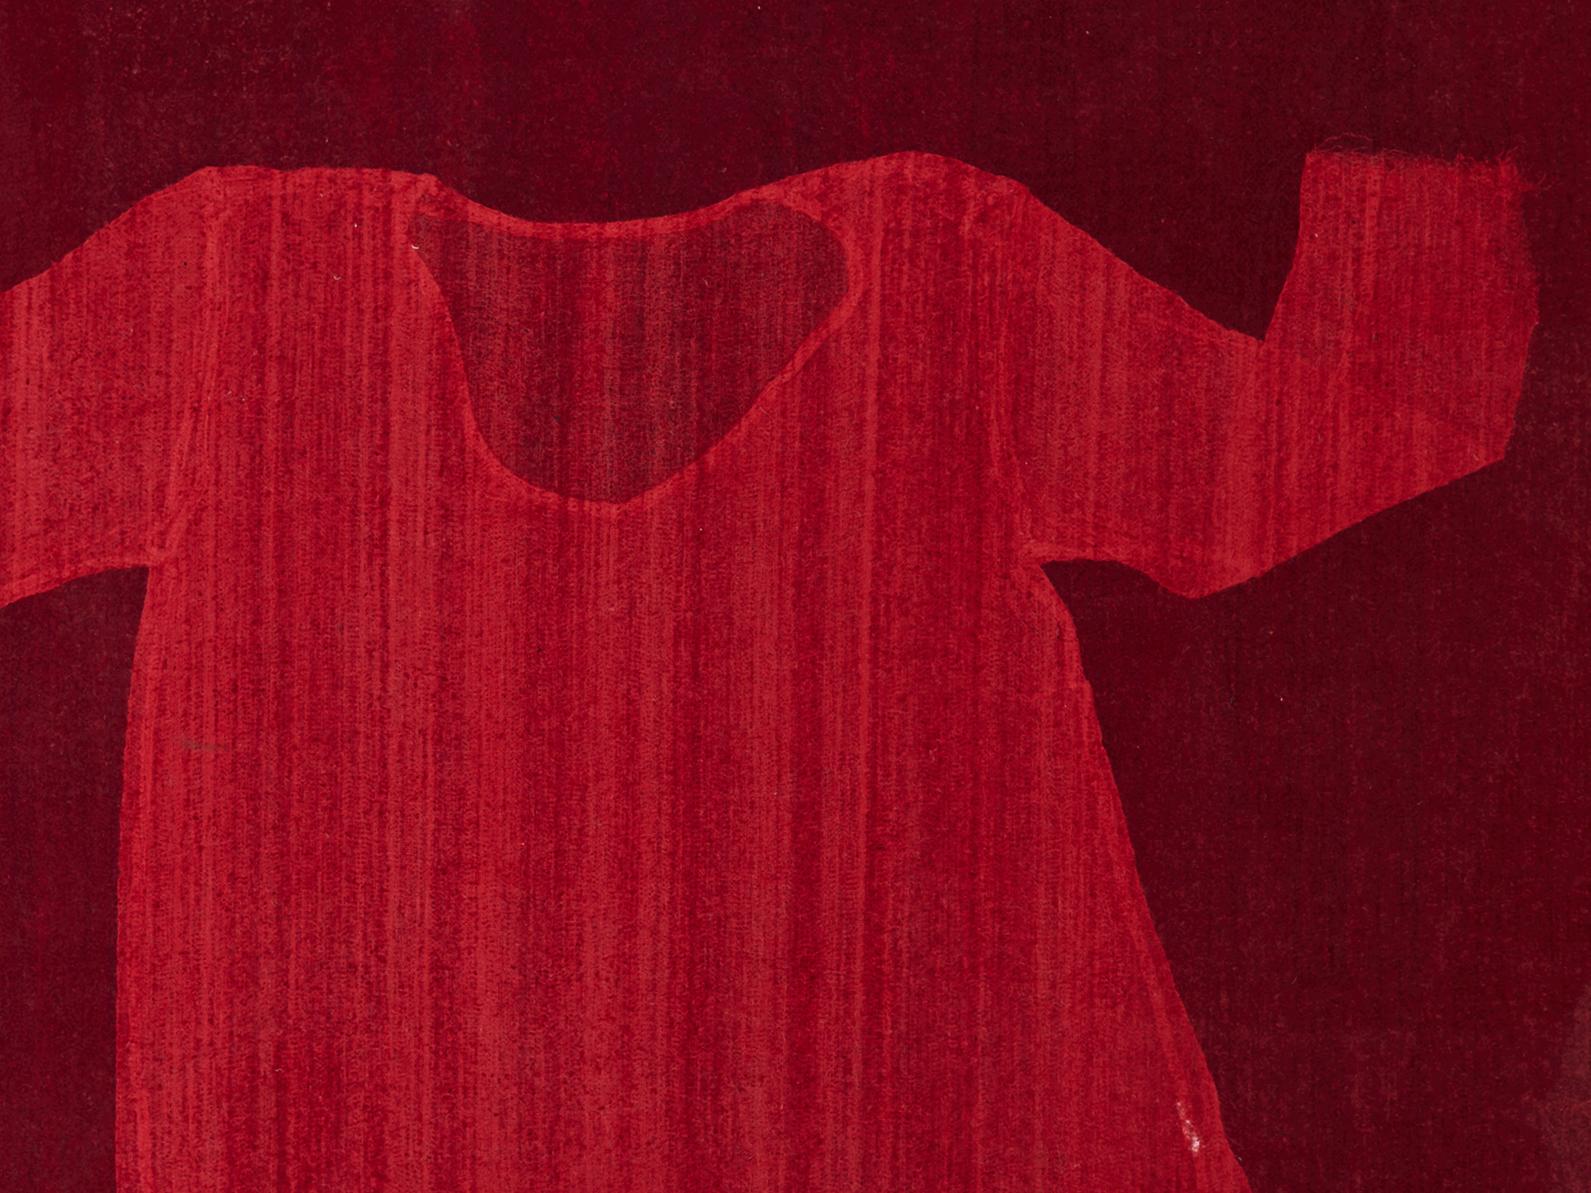 My-Old-Red-Shirt D.jpg